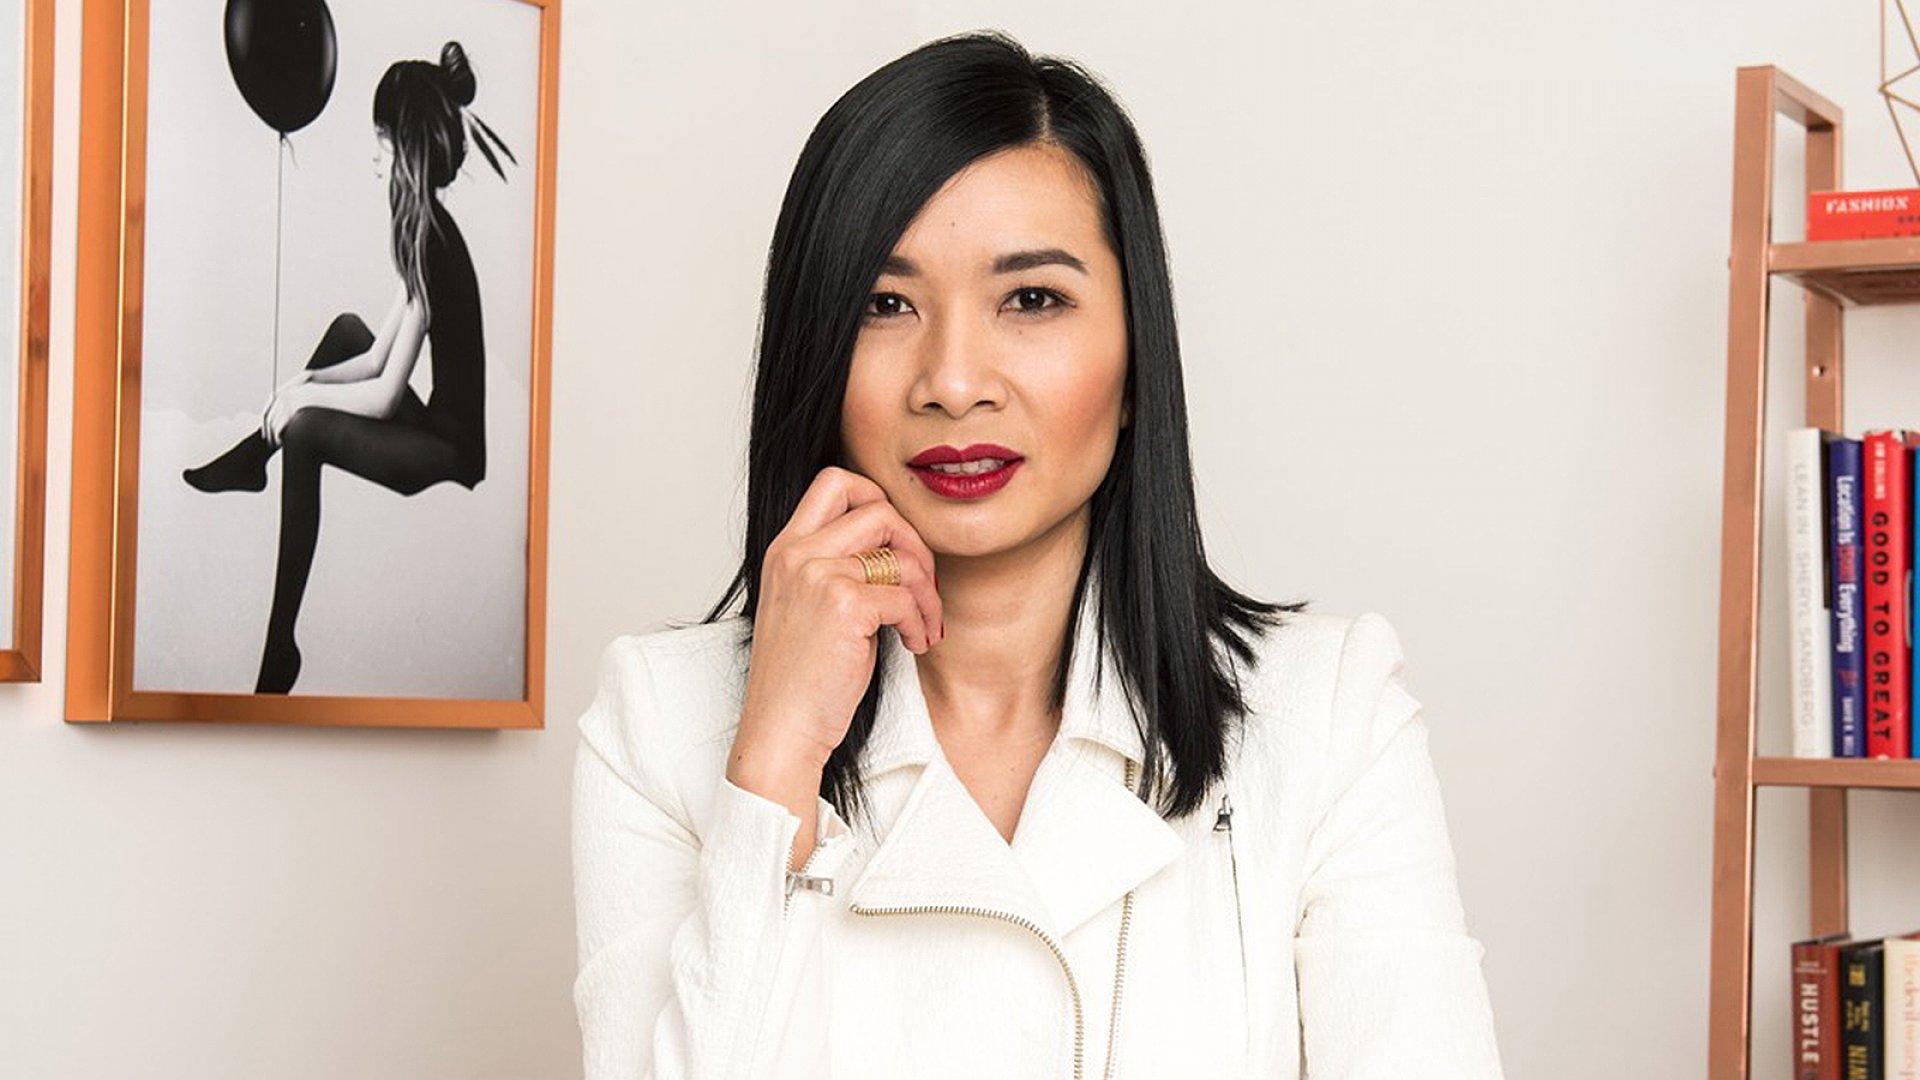 Monica Phromsavanh, CEO and founder of Modabox.